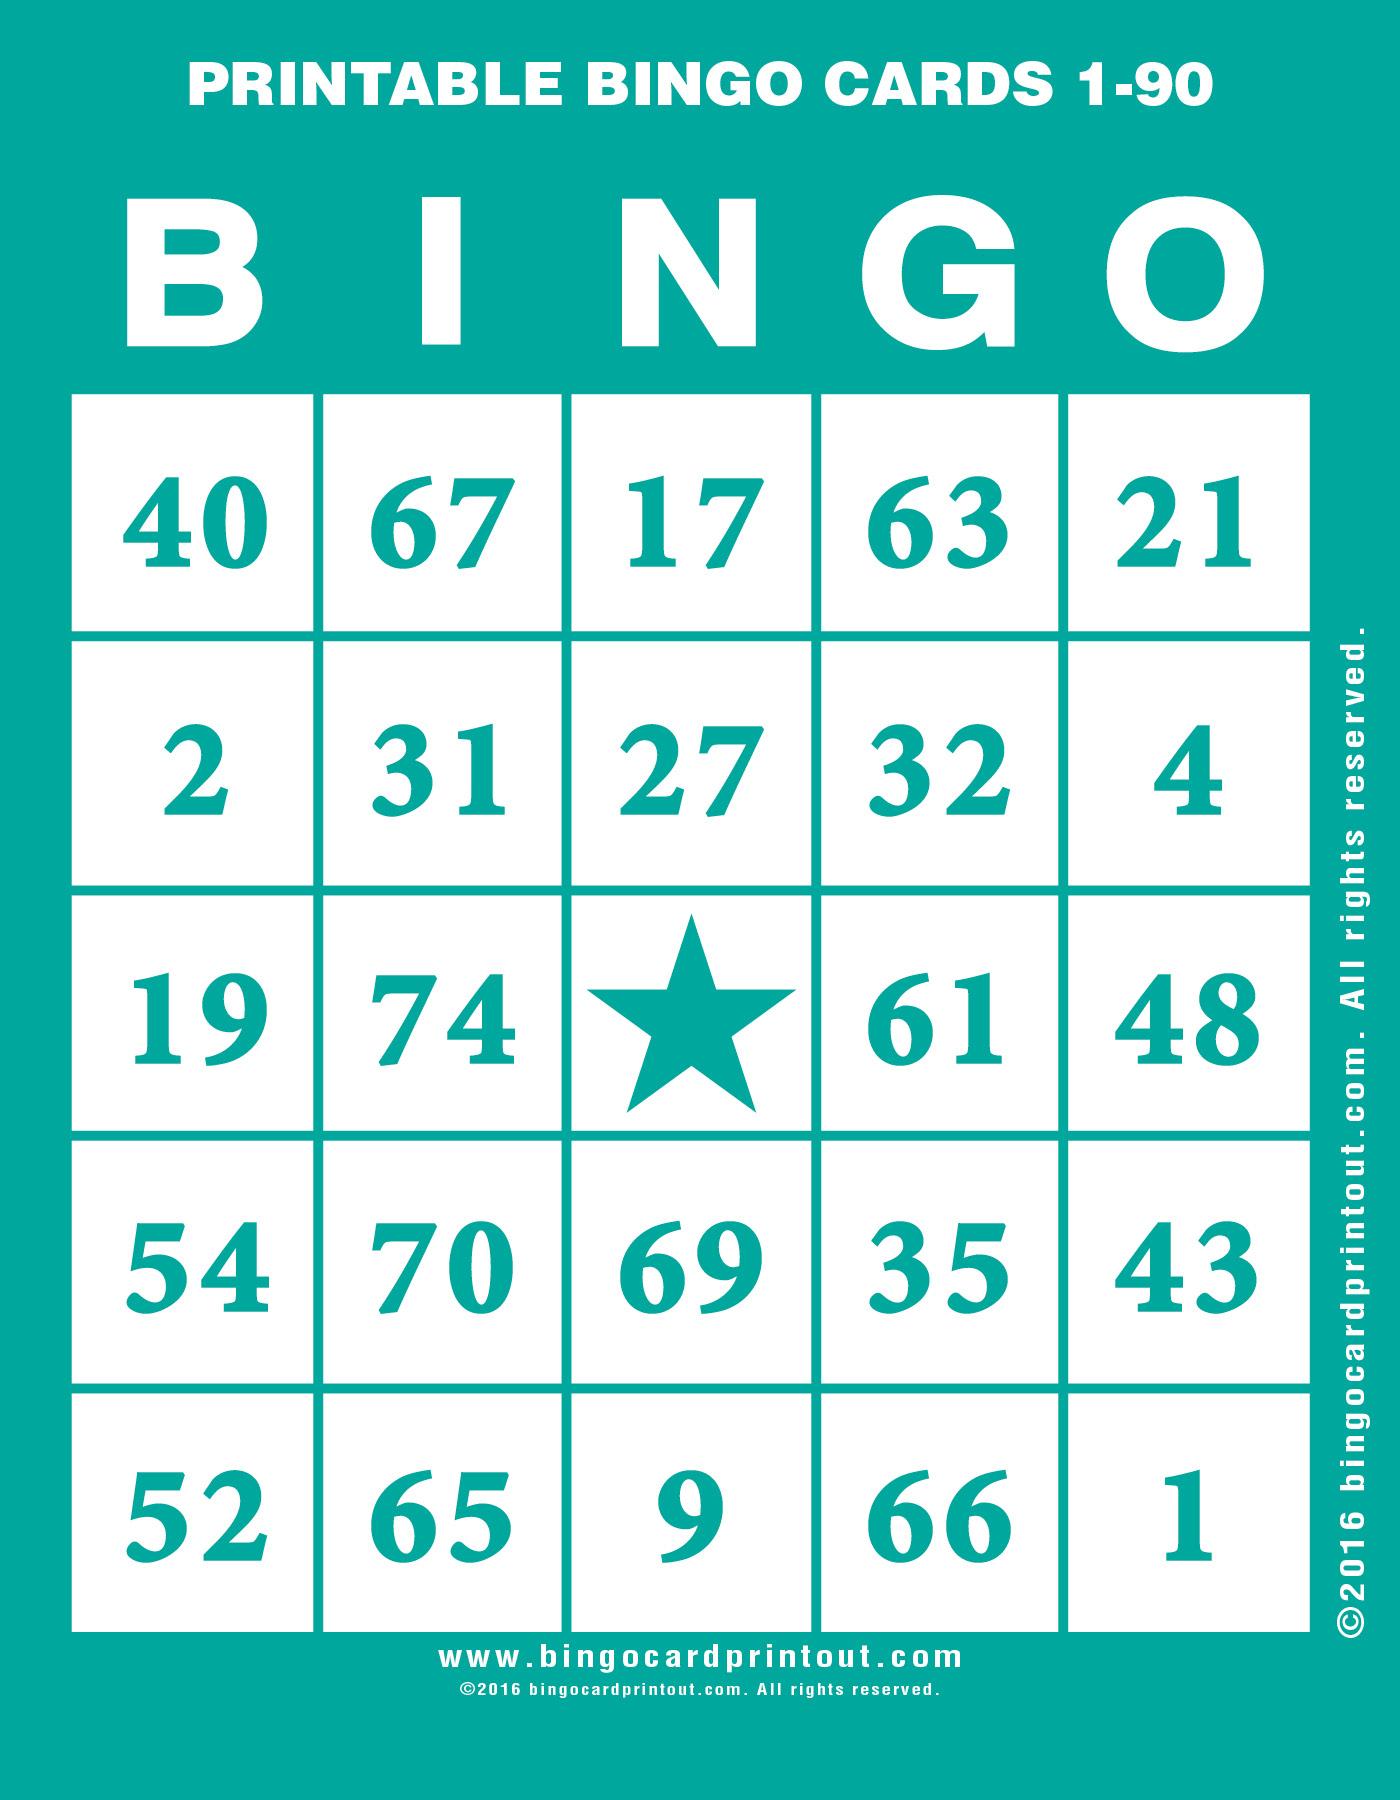 Printable Bingo Cards 1-90 - BingoCardPrintout.com